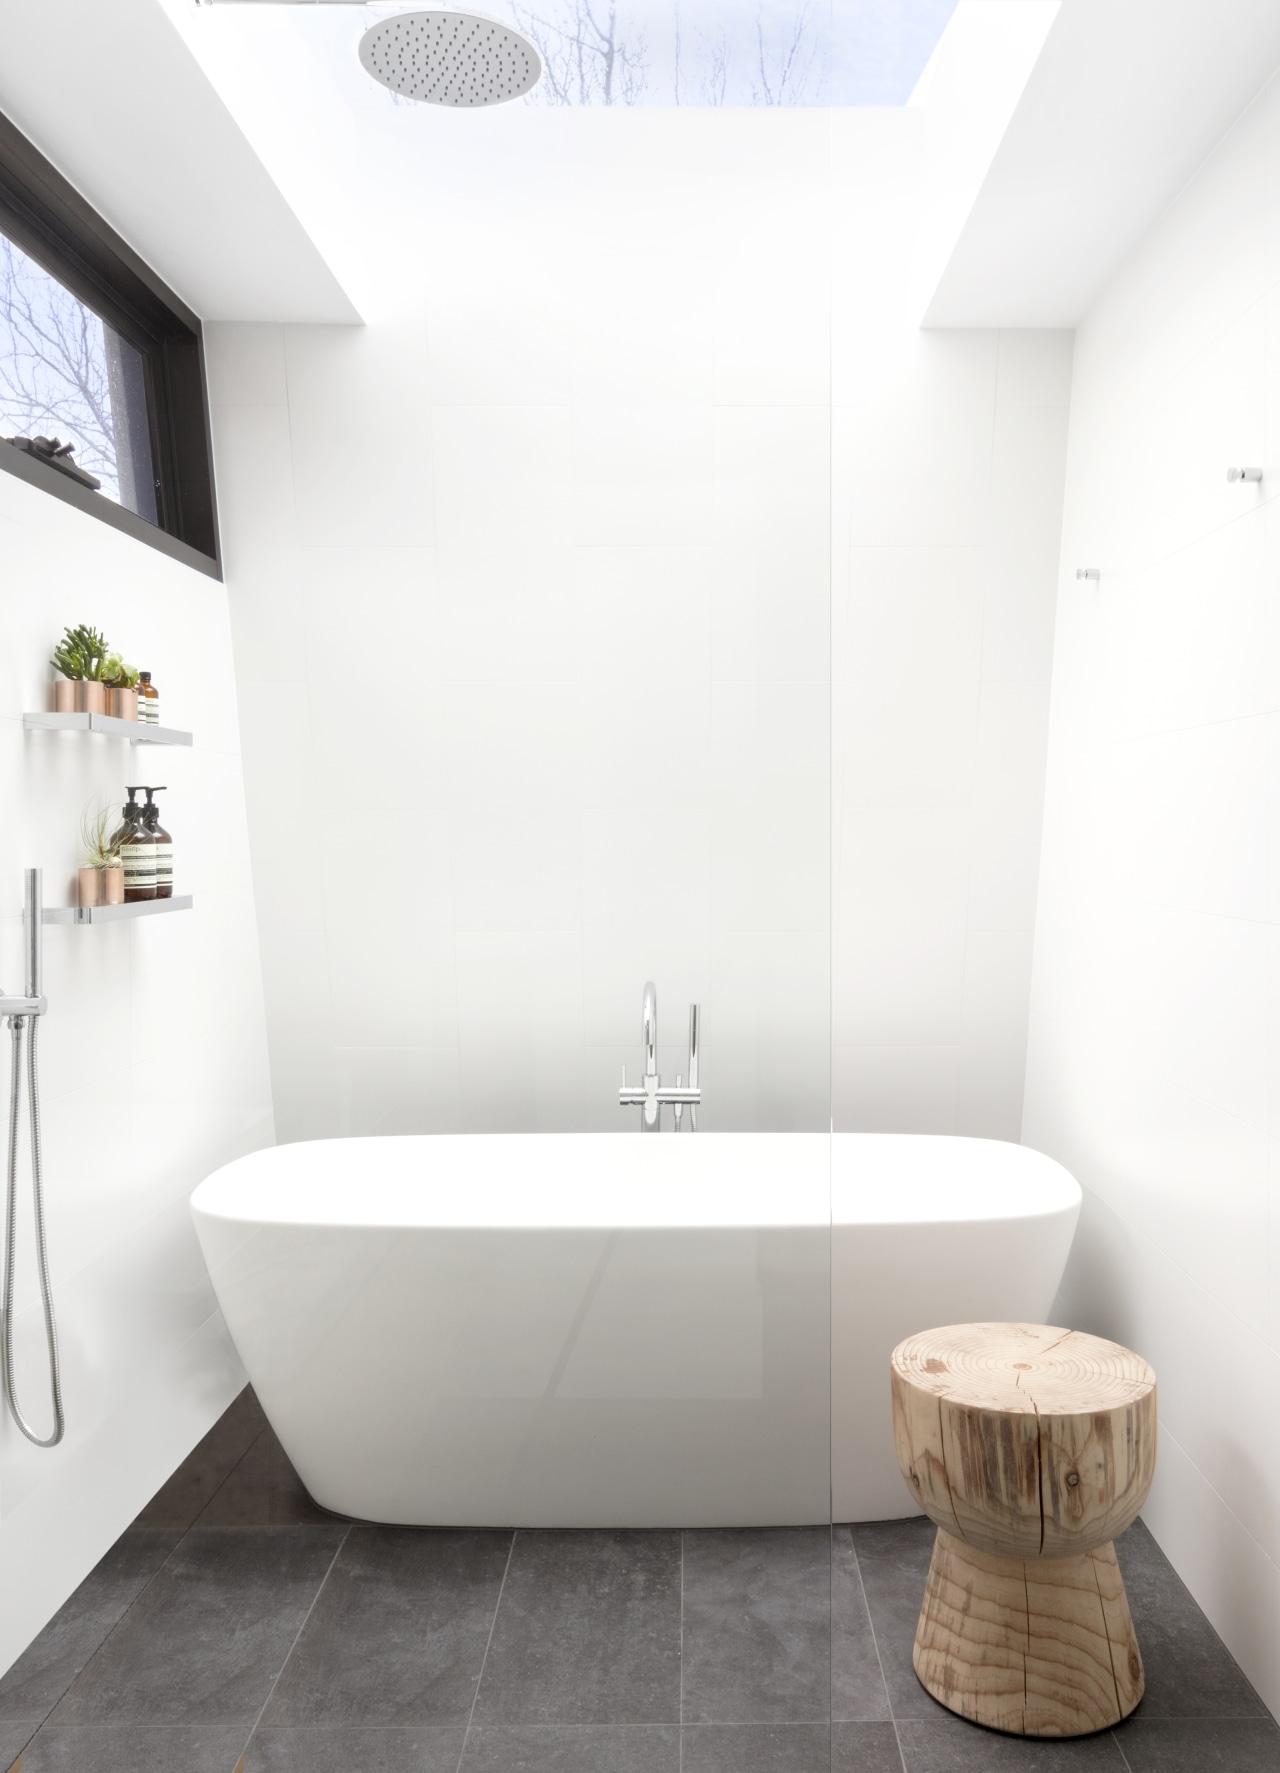 A large skylight over the shower, a soft-edged architecture, bathroom, bathtub, ceramic tiles, floor, flooring, plumbing fixtures, tap, tile, rainhead shower